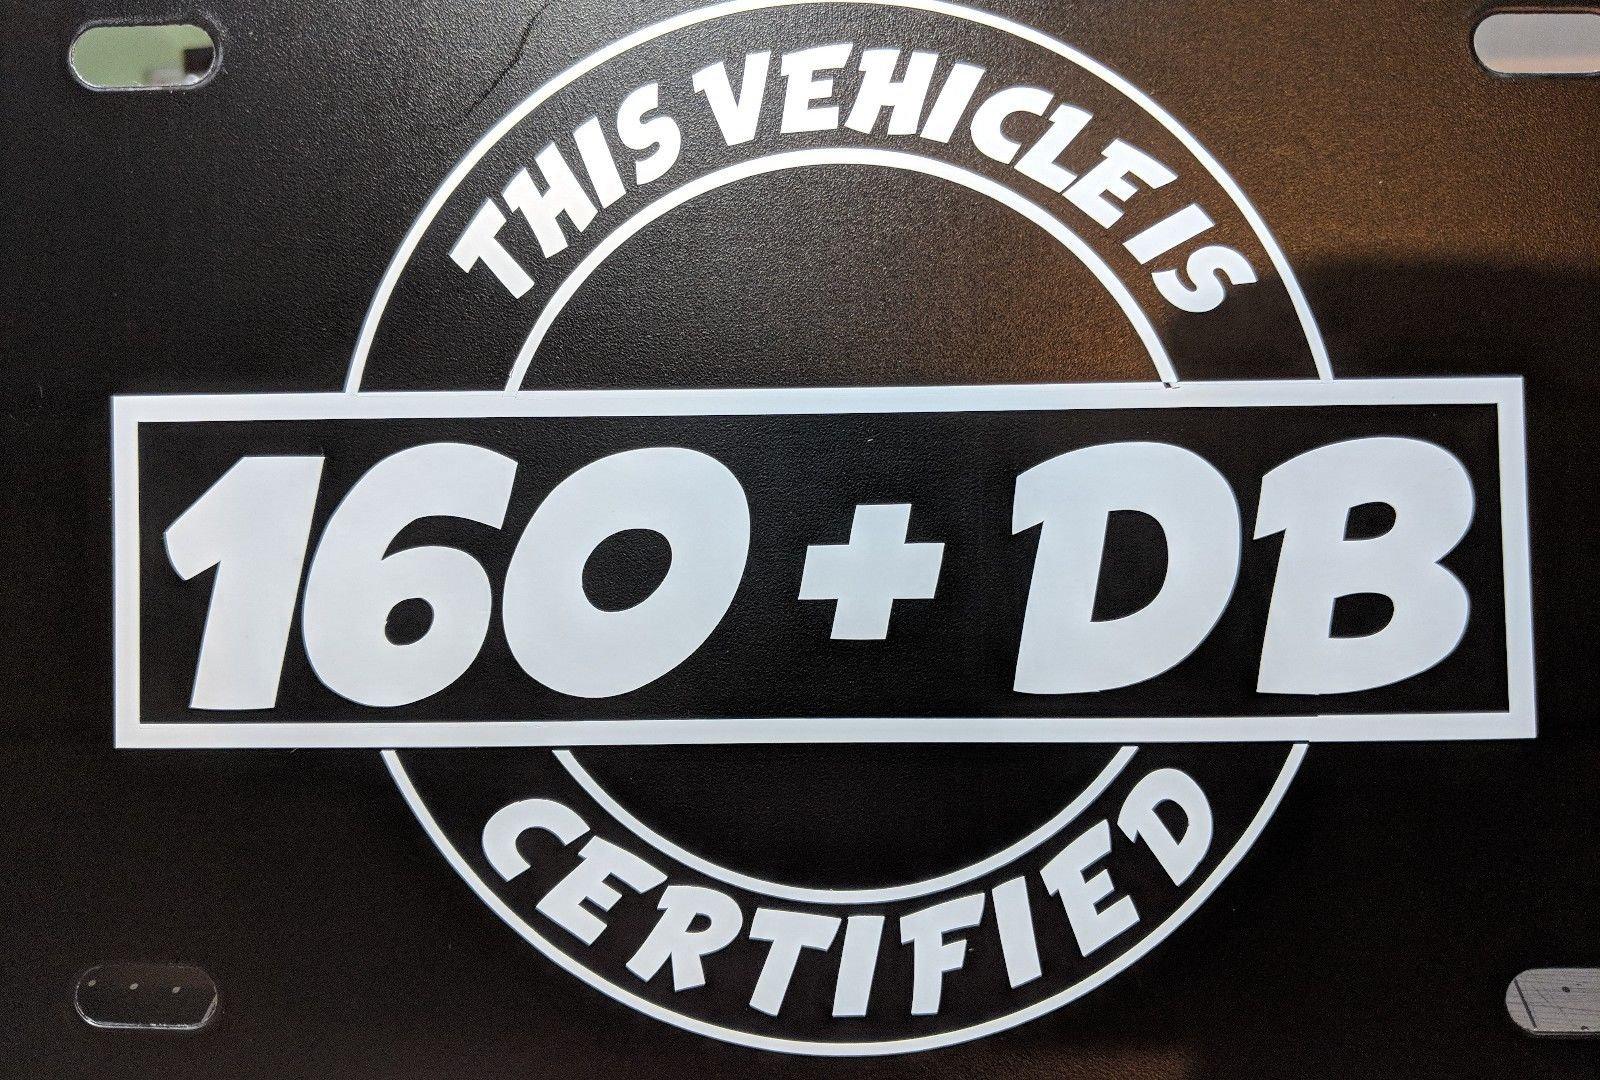 Chevrolet Bowtie Logo Plastic License Plate Frame Decal Vinyl